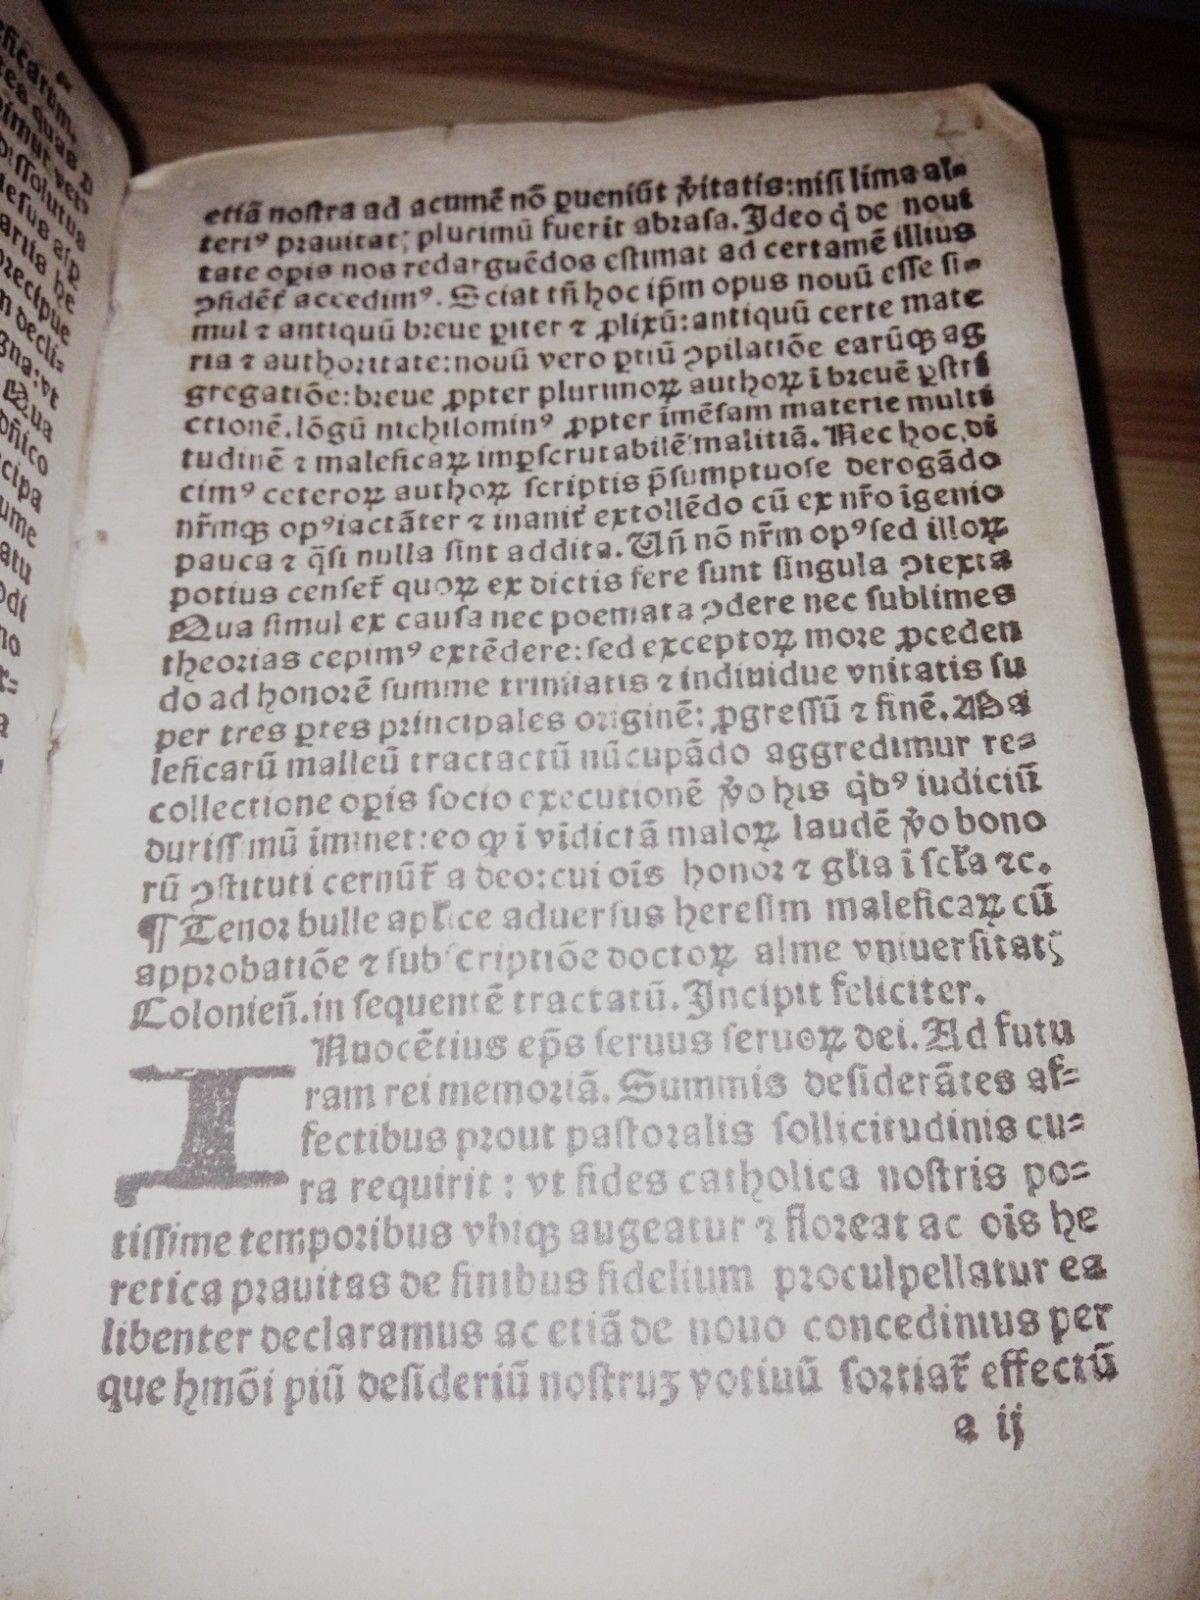 1535 Edition of the Malleus Maleficarum For Sale